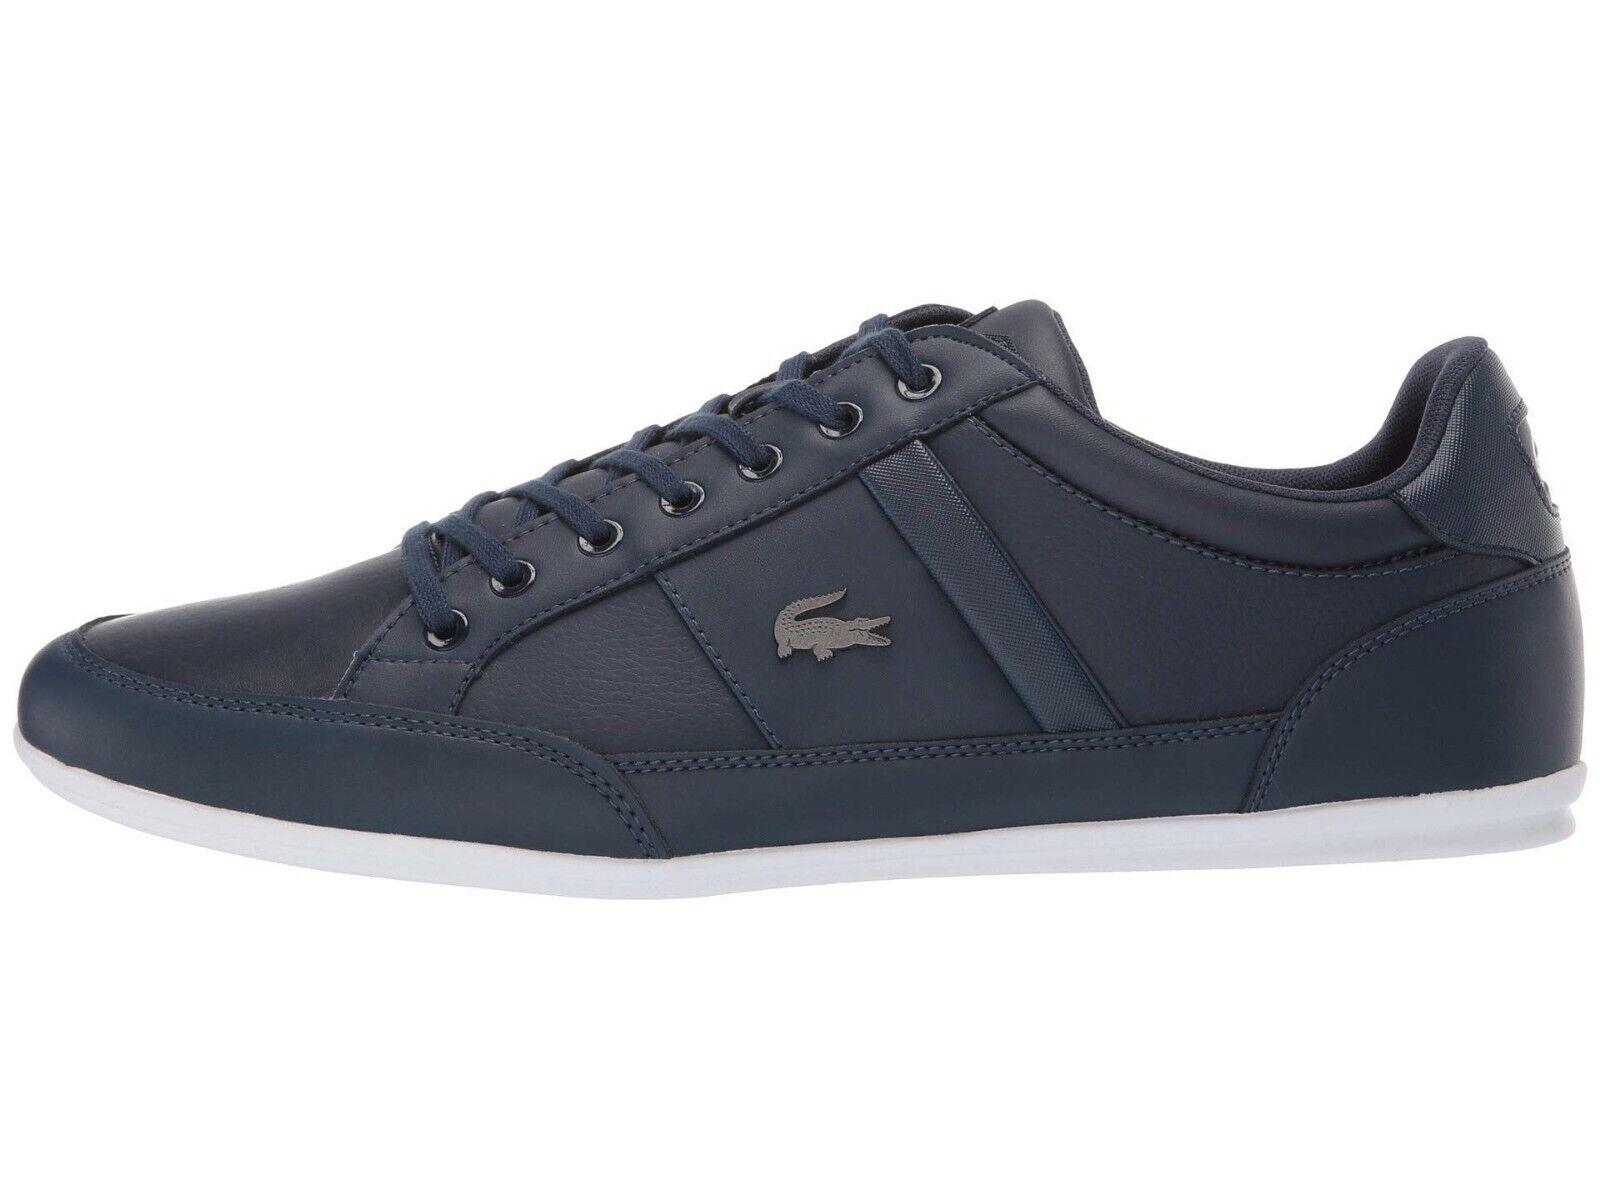 LACOSTE Chaymon BL Navy Blue Croc Logo Leather Shoes Men's Fashion Sneakers